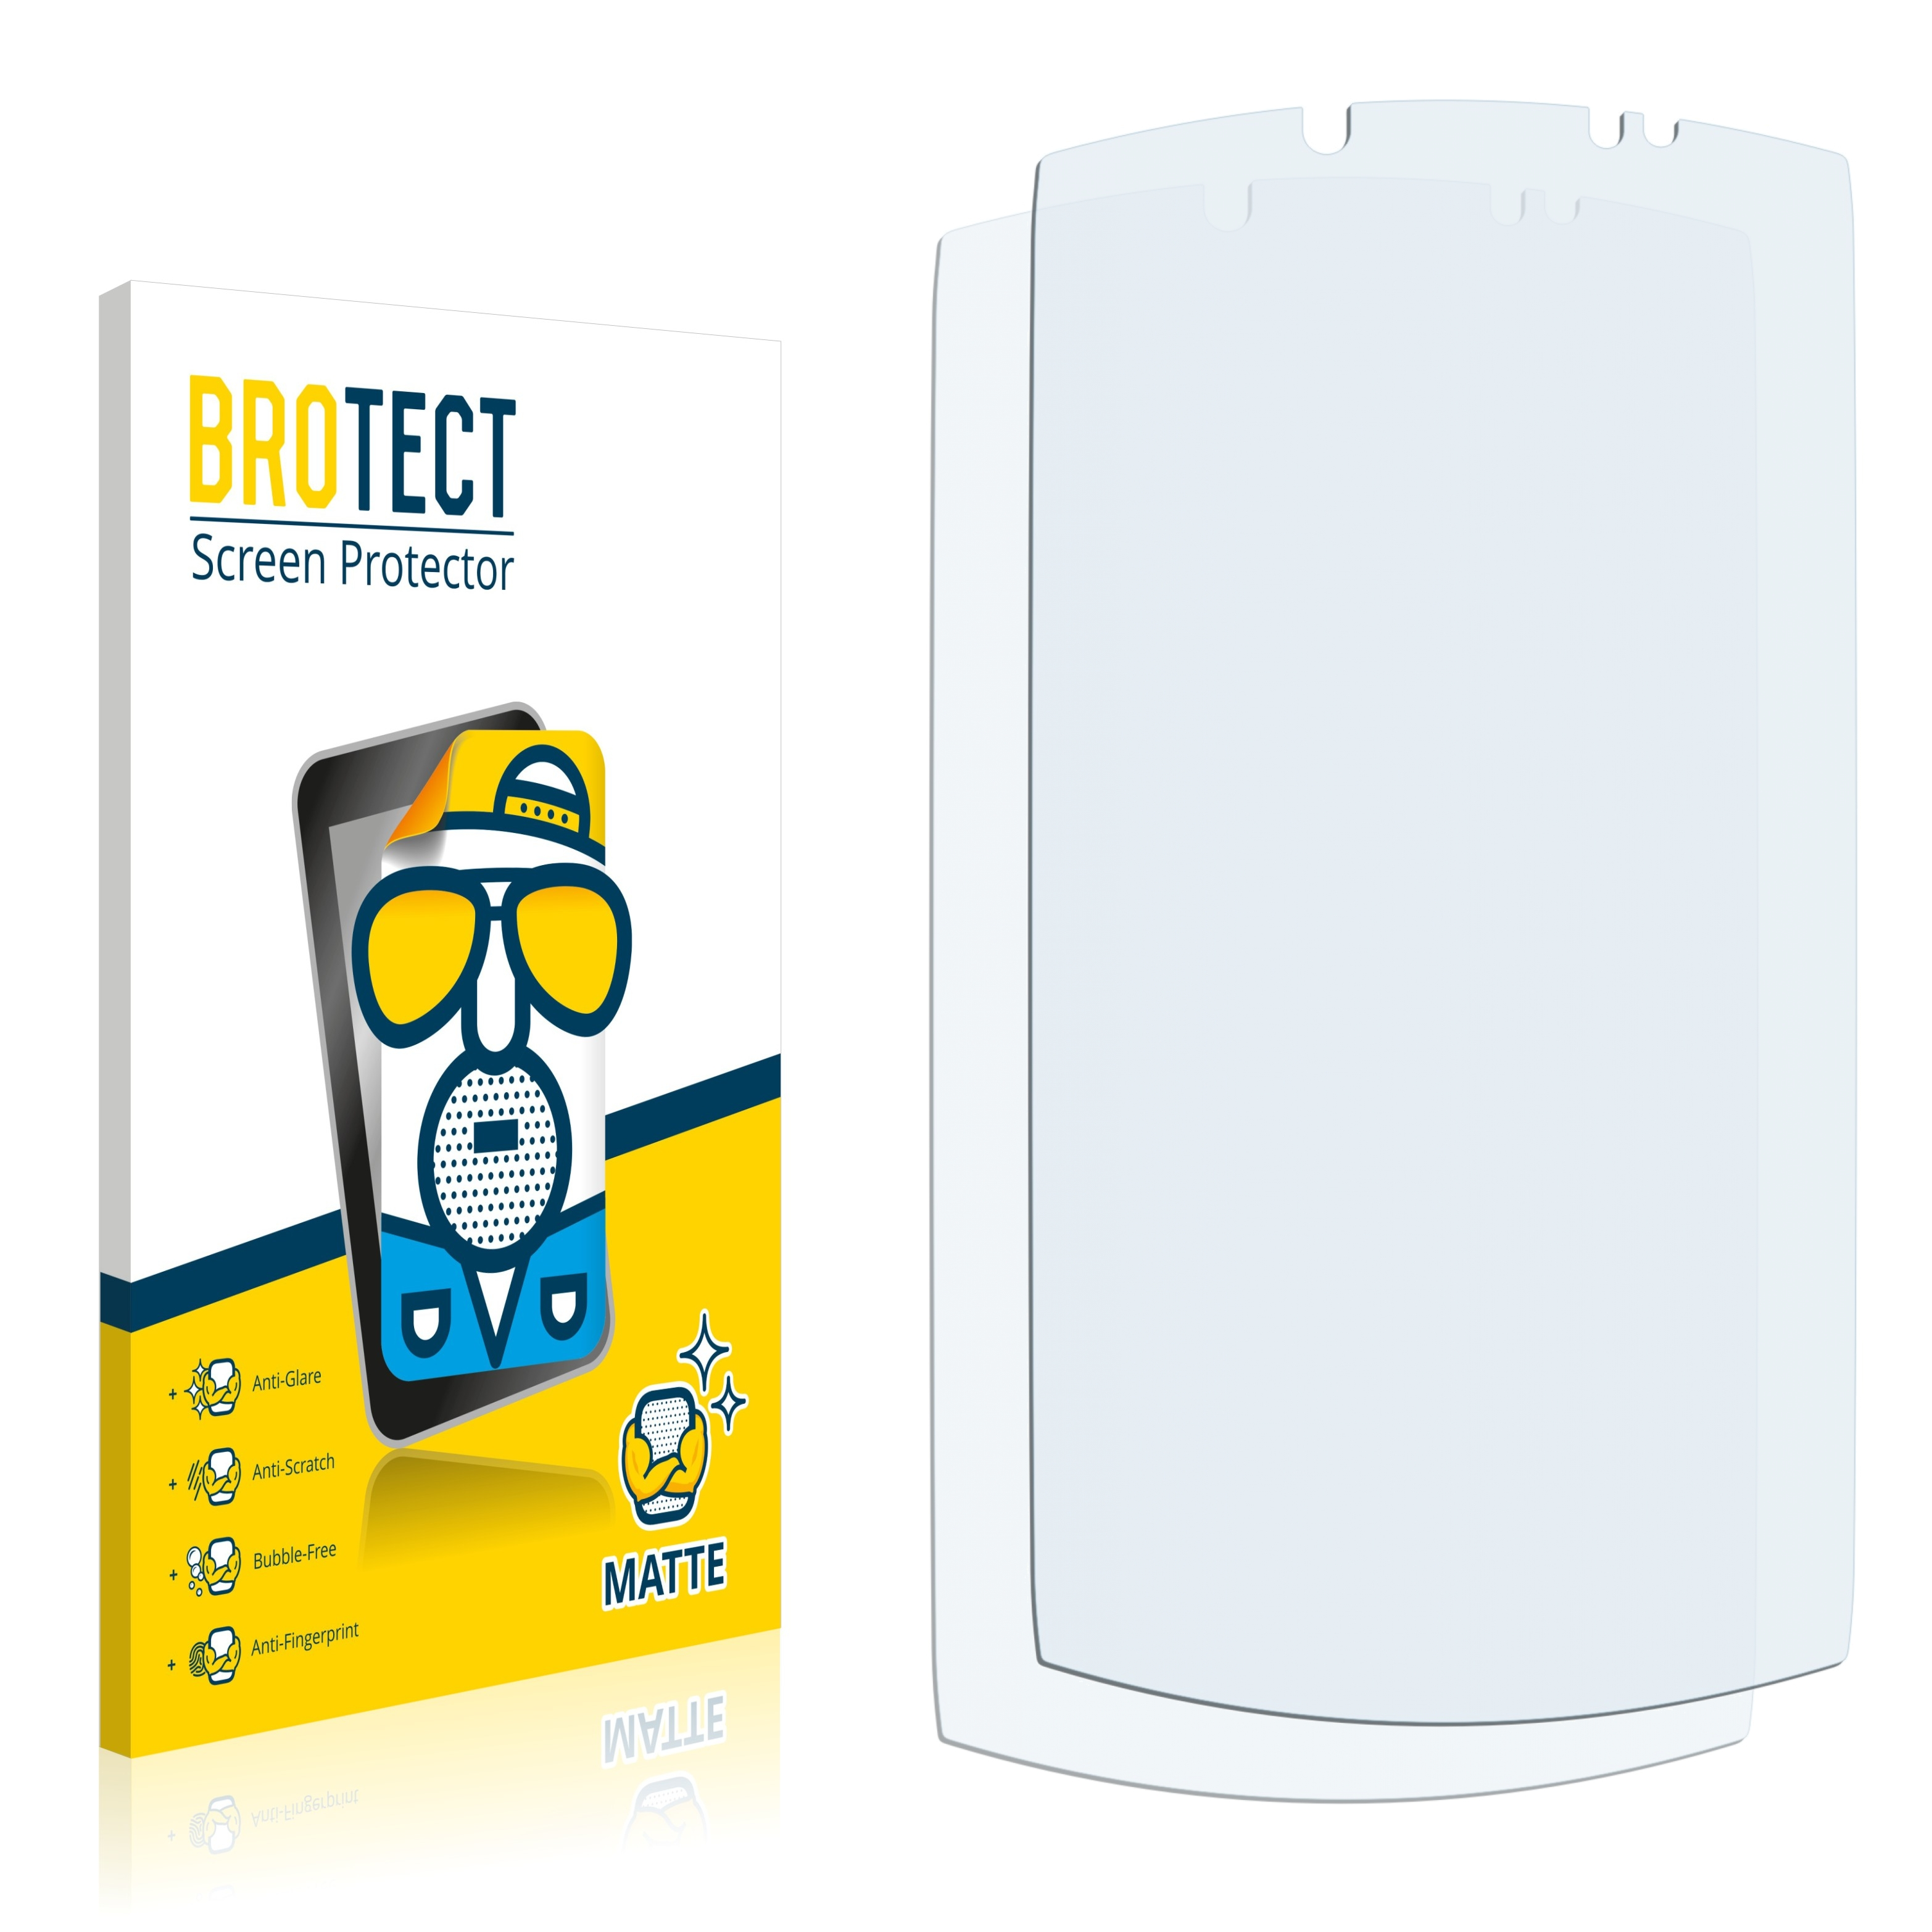 Matná ochranná fólie BROTECT pro Acer S500 CloudMobile, 2 ks